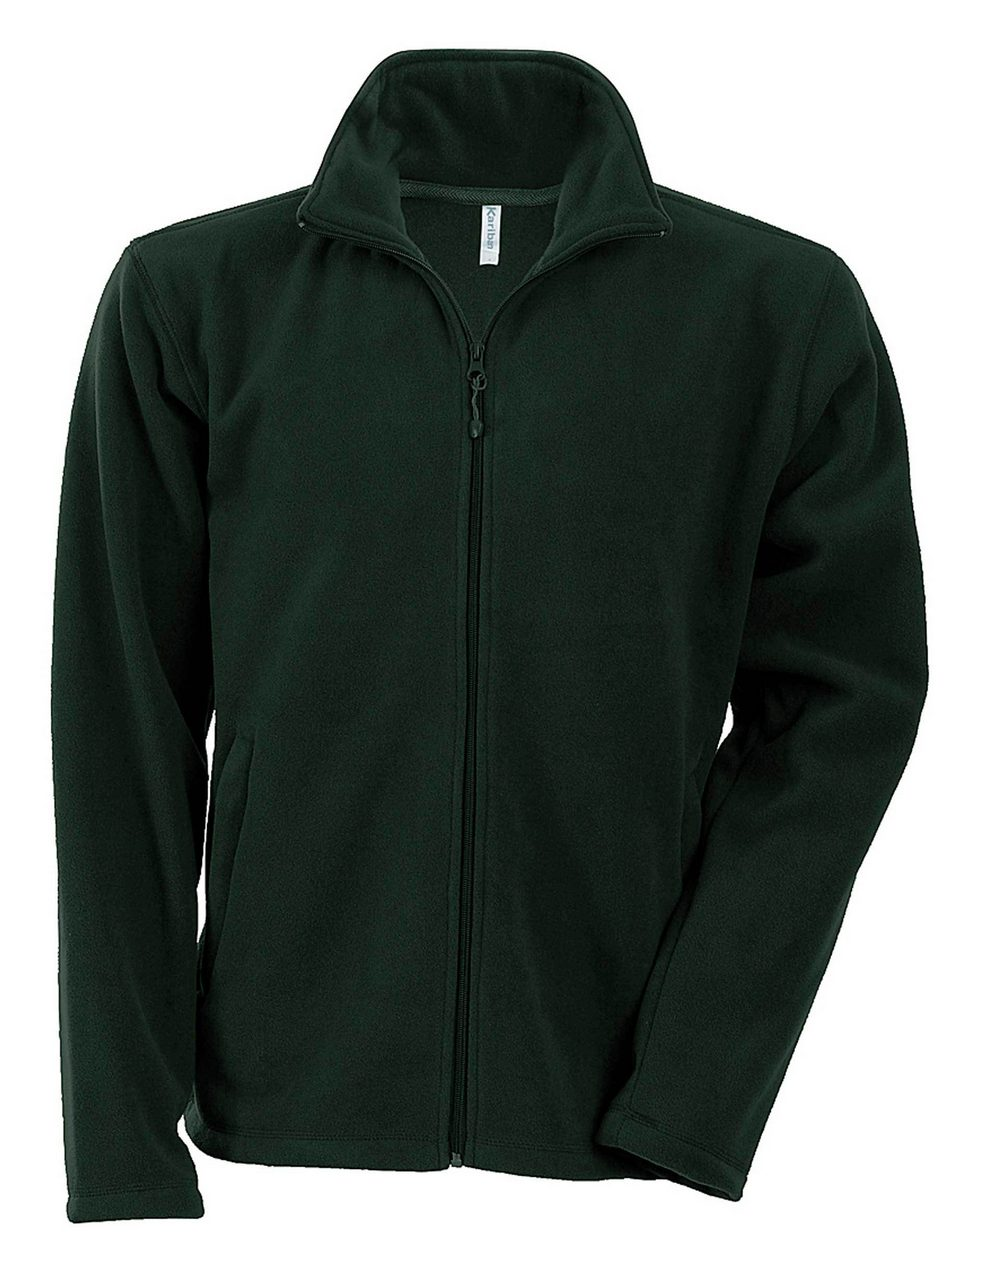 Fleece KA911 verde inchis forest veste jachete dama barbatesti polar fleece softshell fas gluga ploaie vant broderie serigrafie termotransfer | Toroadv.ro